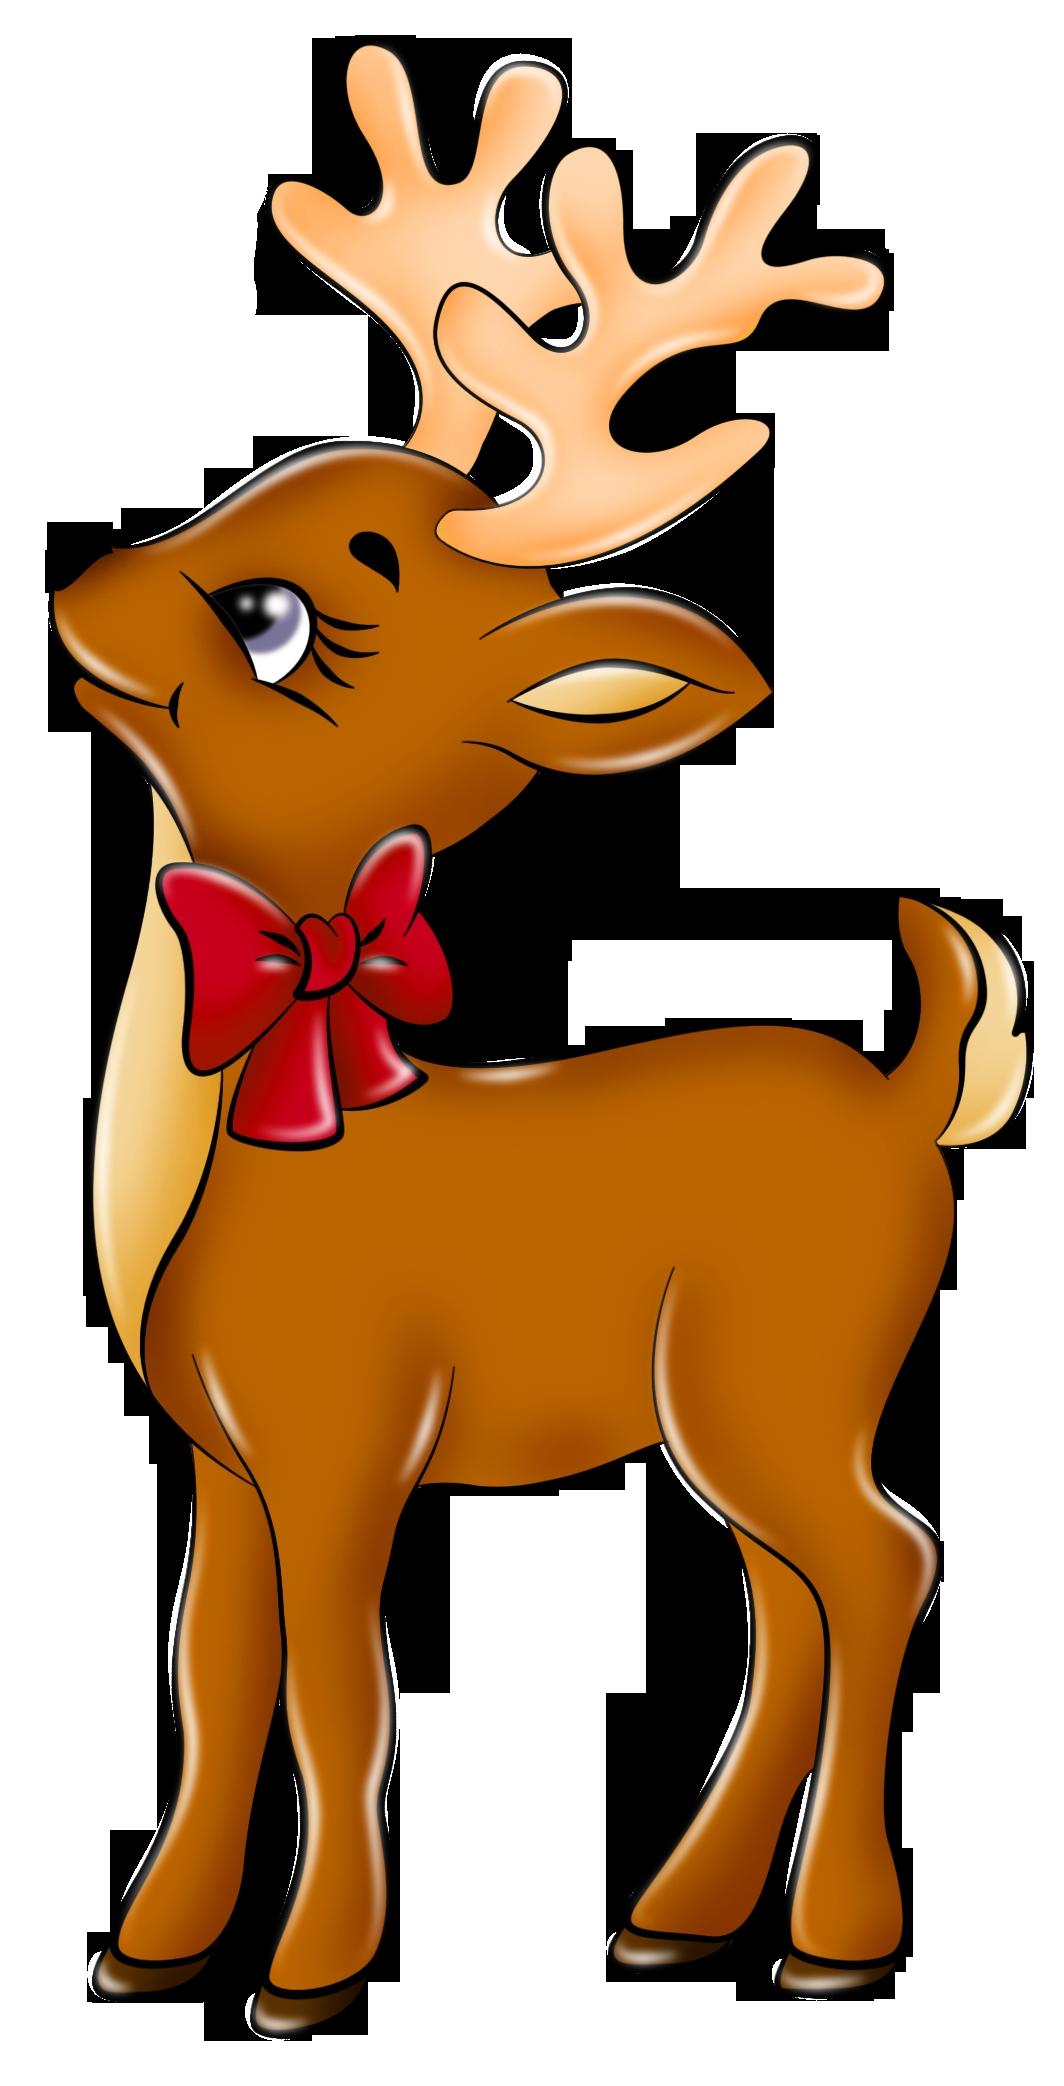 1064x2086 Fresh Reindeer Clipart Design